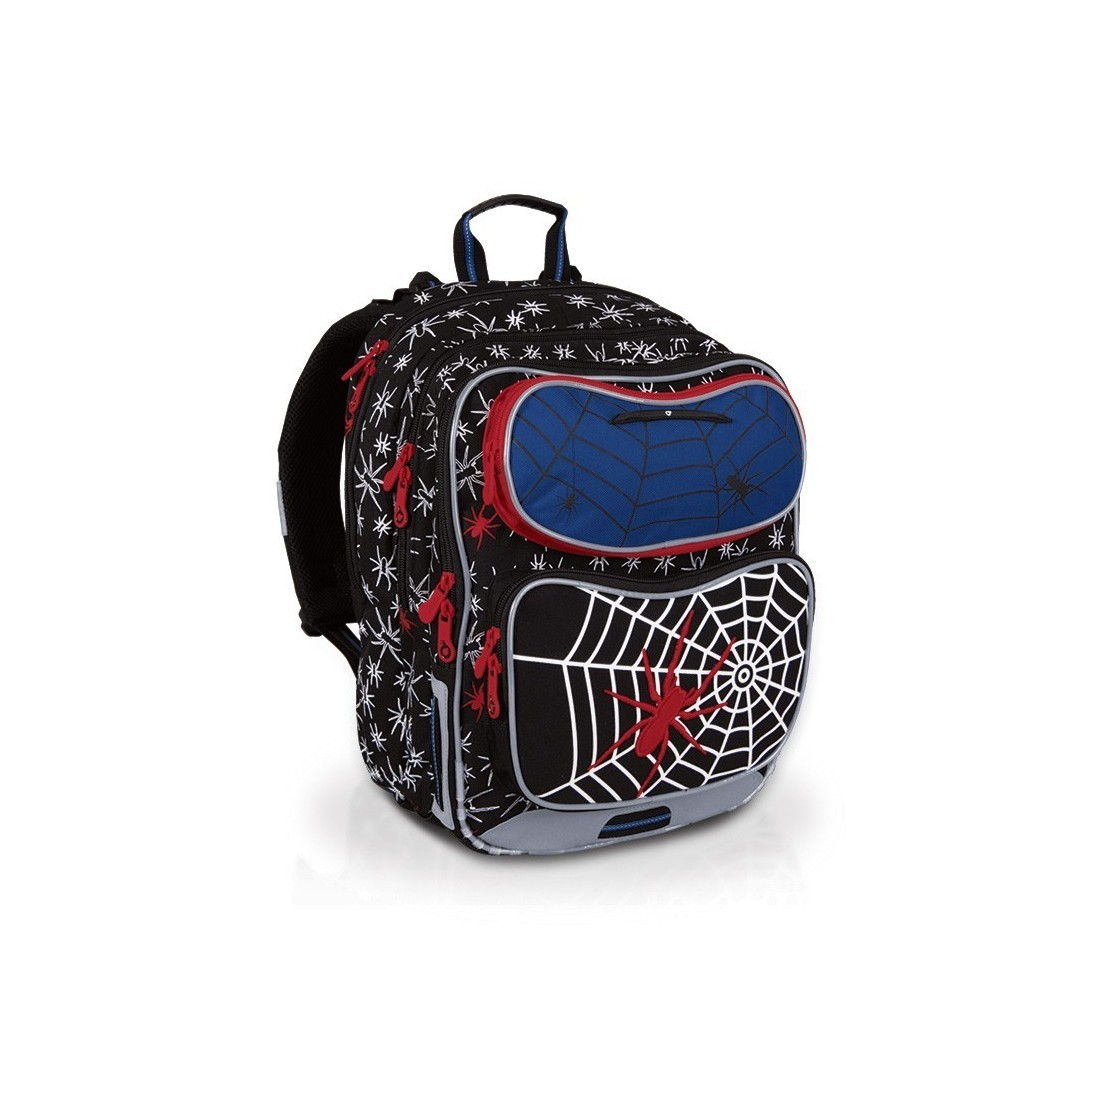 a1bf4b3311570 Plecak szkolny CHI 601 TOPGAL - plecak-tornister.pl